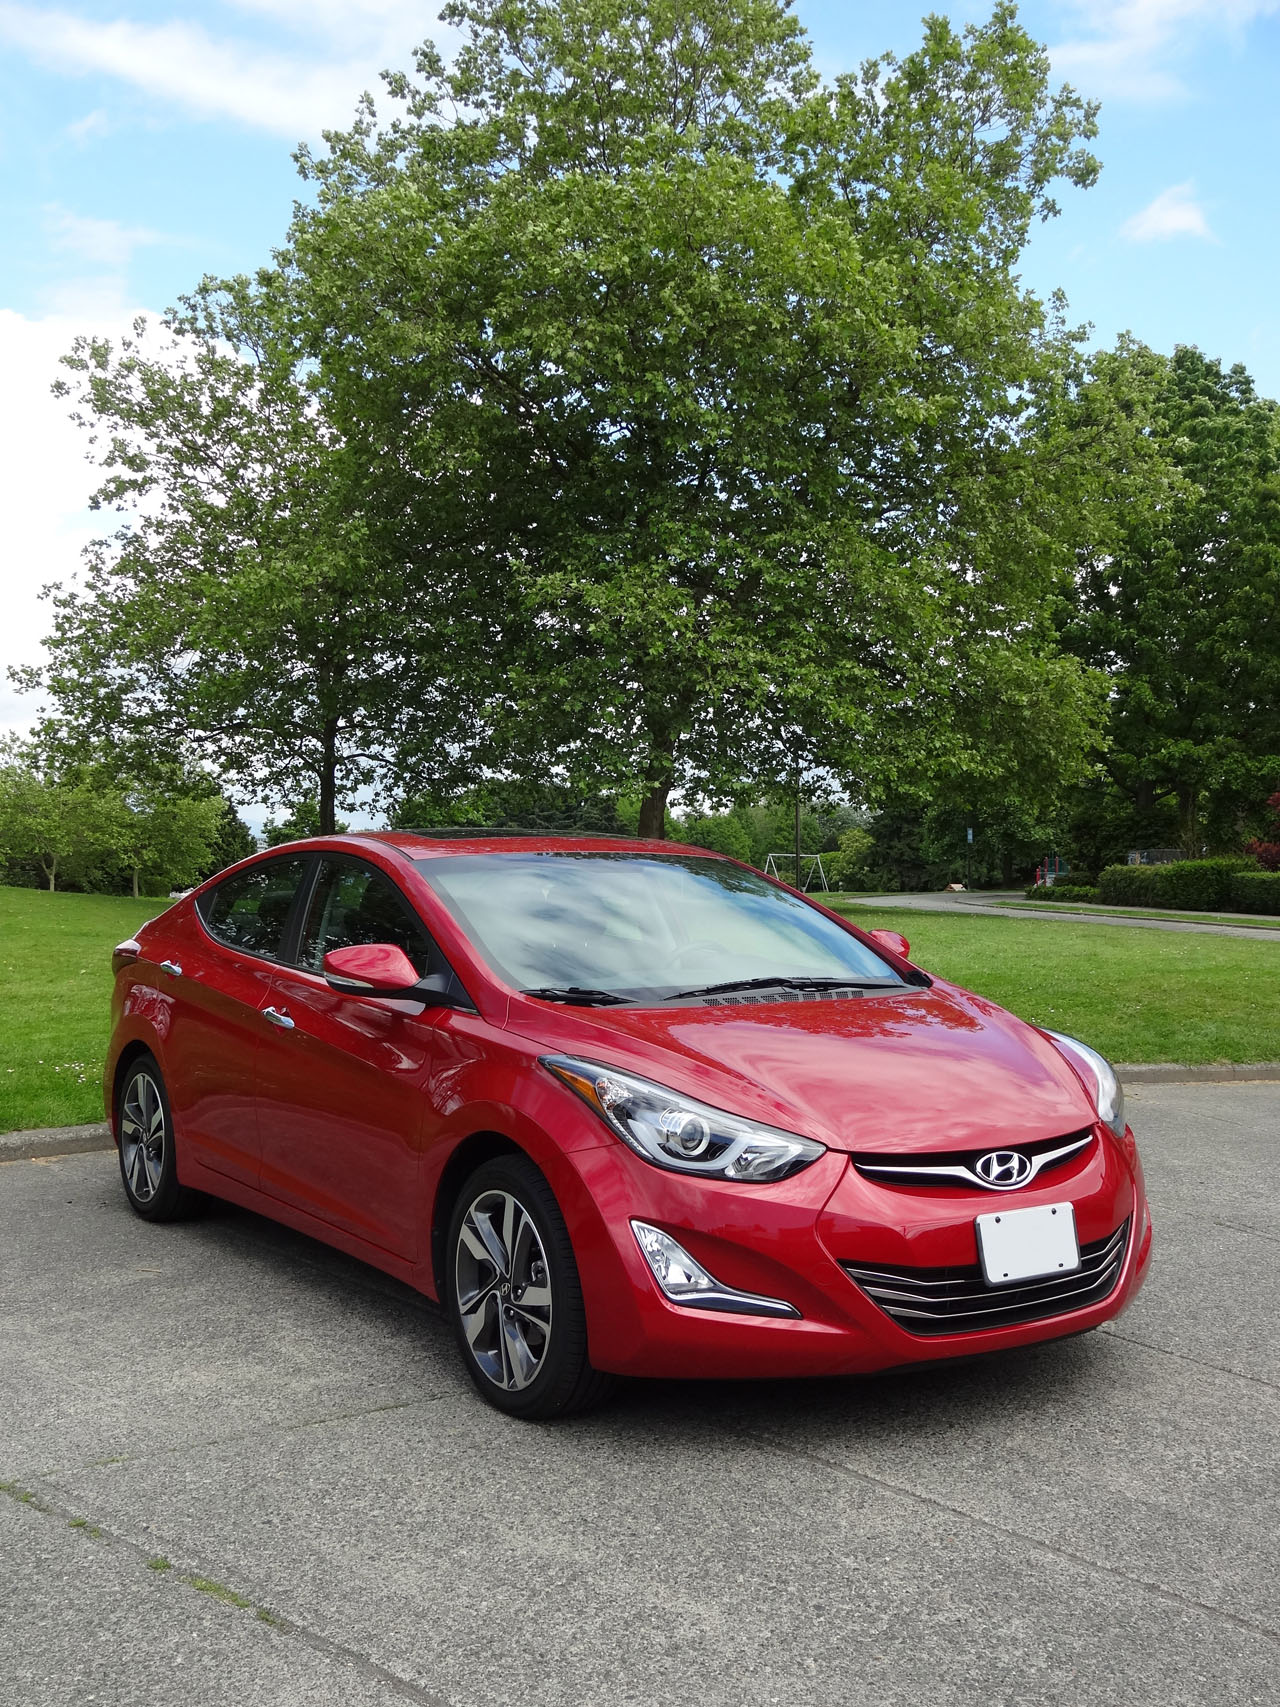 2014 Hyundai Elantra Limited Road Test Review Carcostcanada